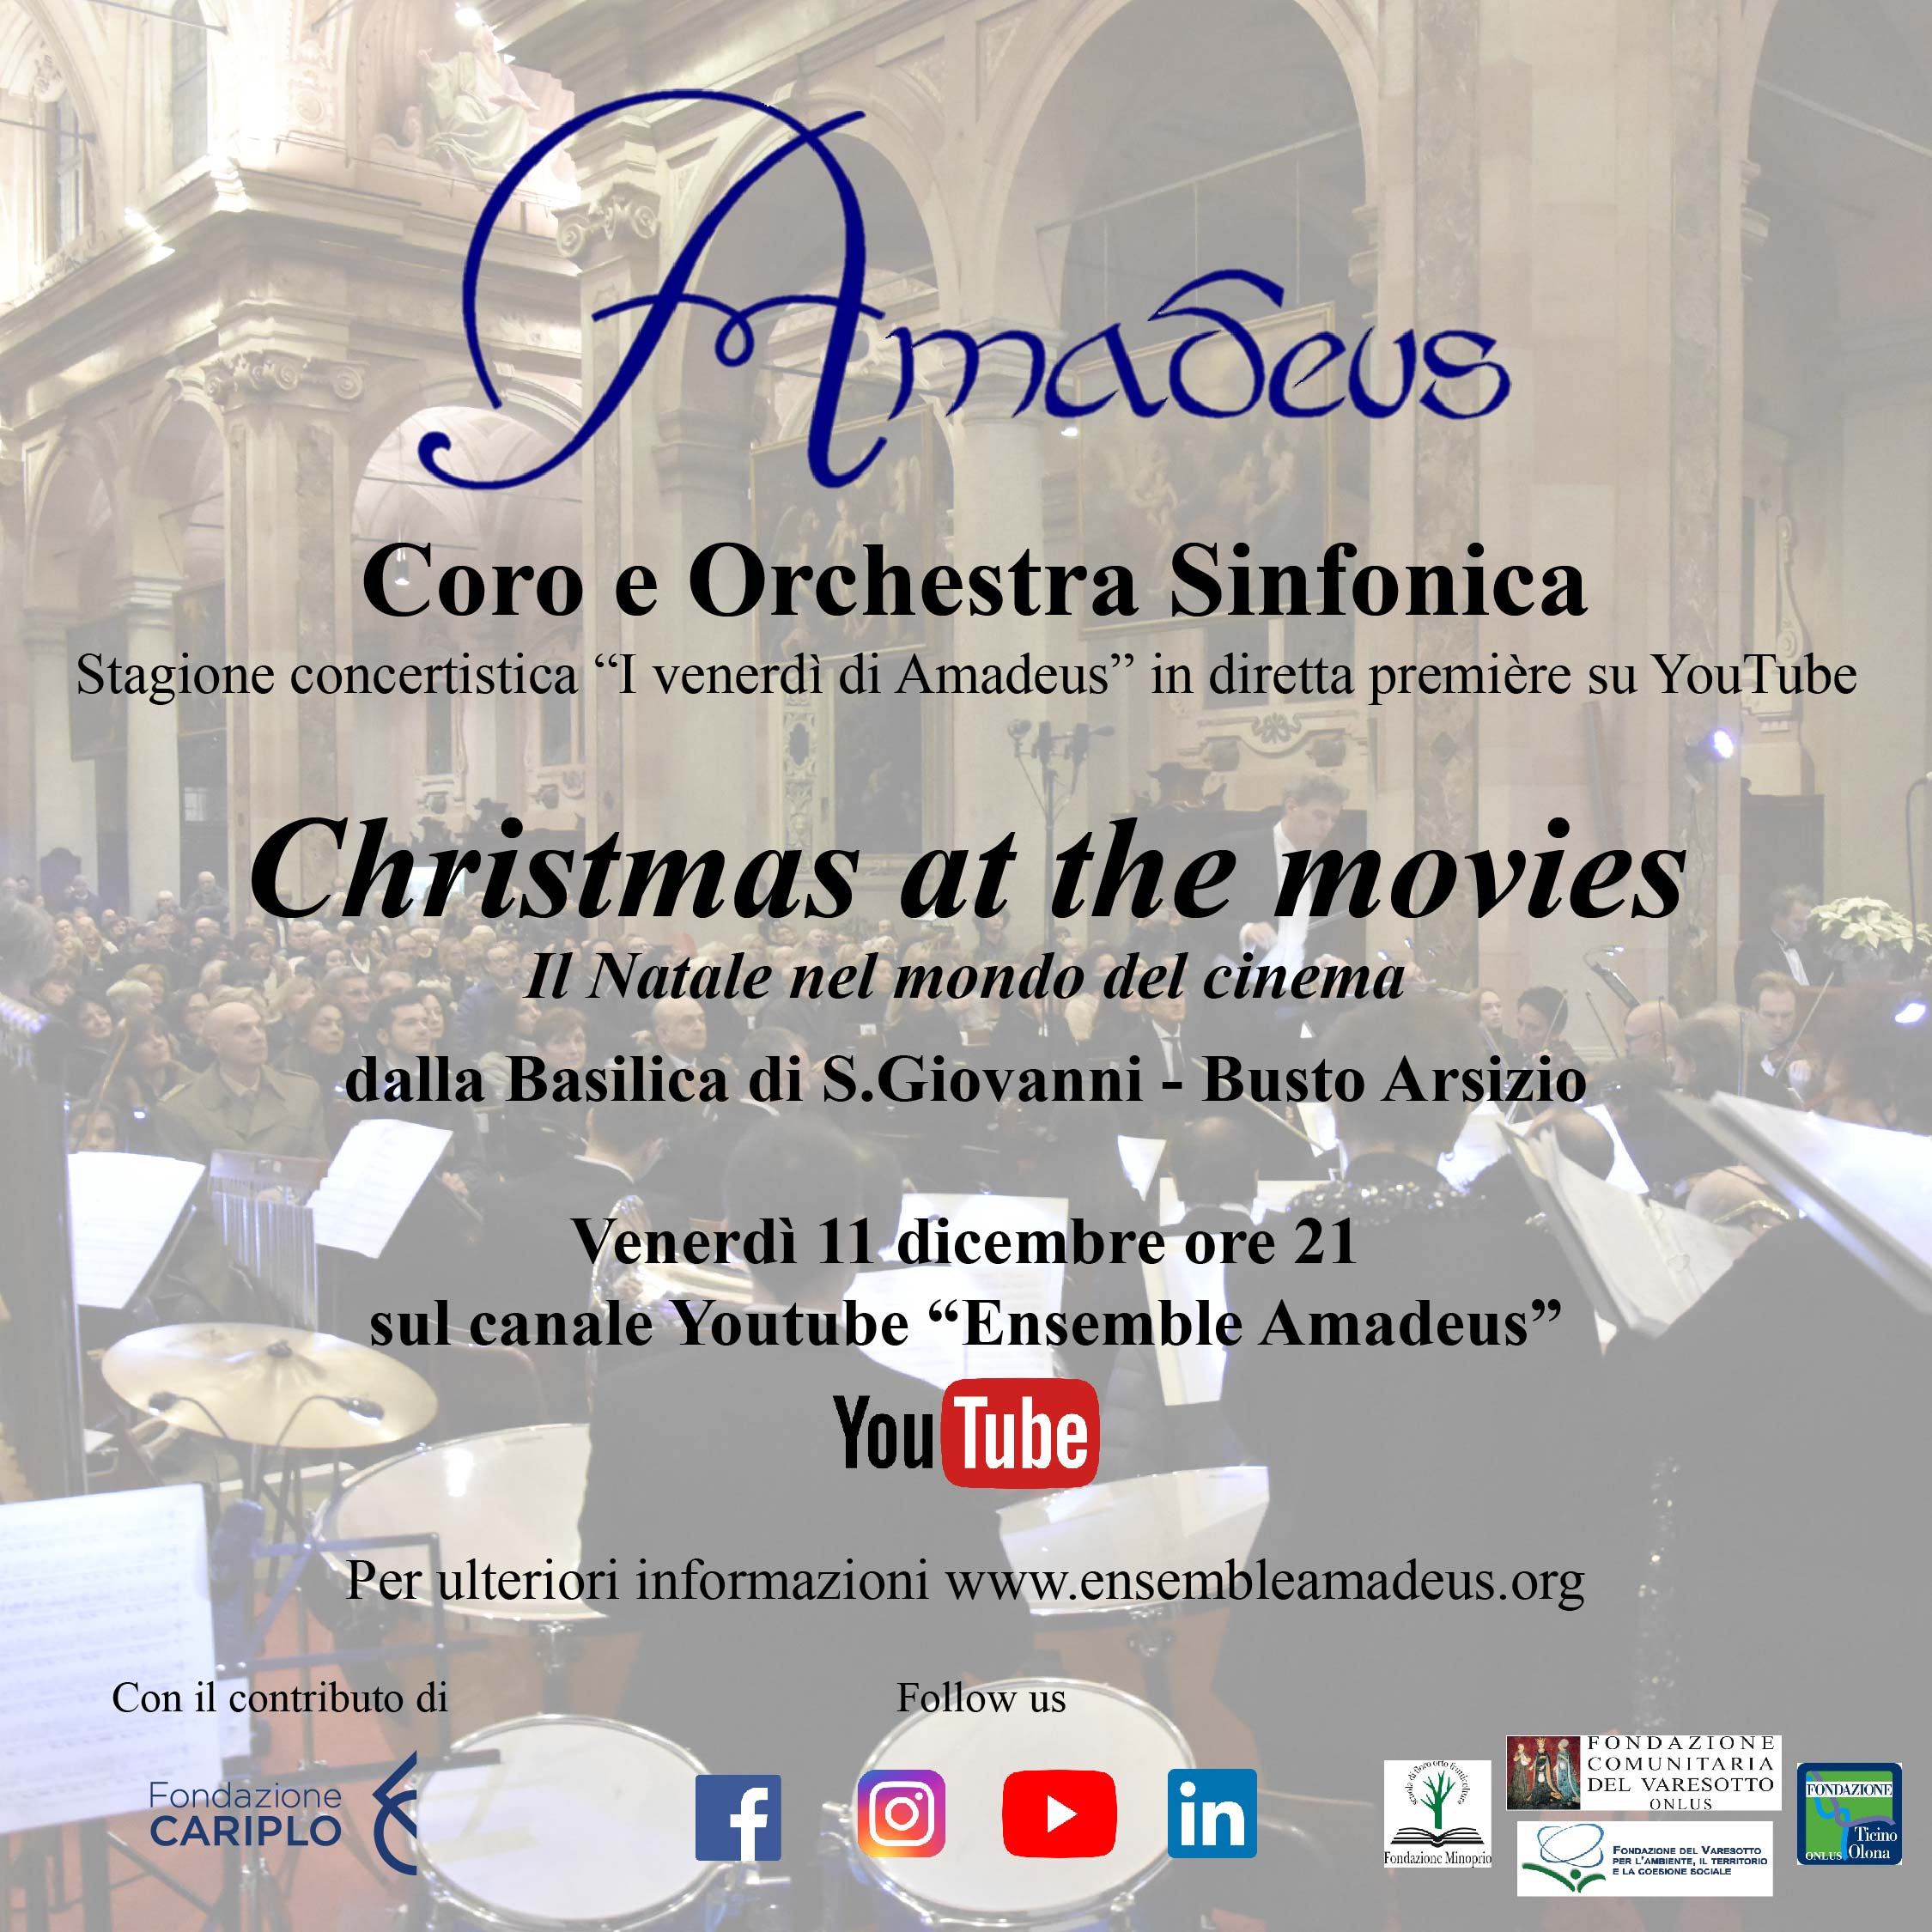 Christmas at the movies - Premiére Amadeus